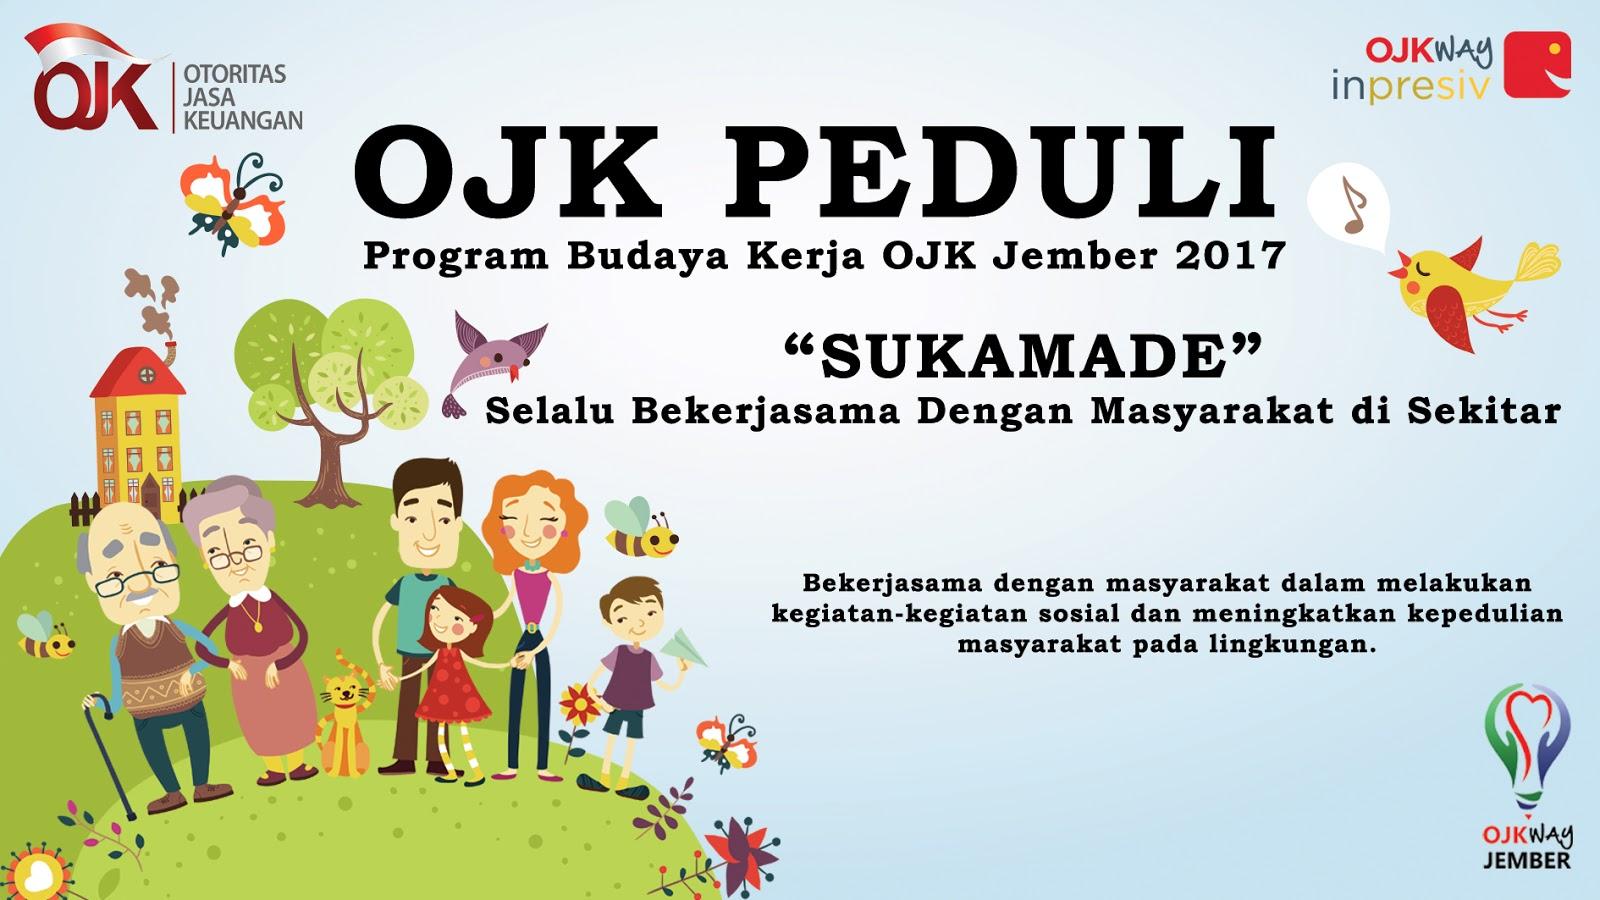 OJK Peduli - Program Budaya Kerja OJK Jember